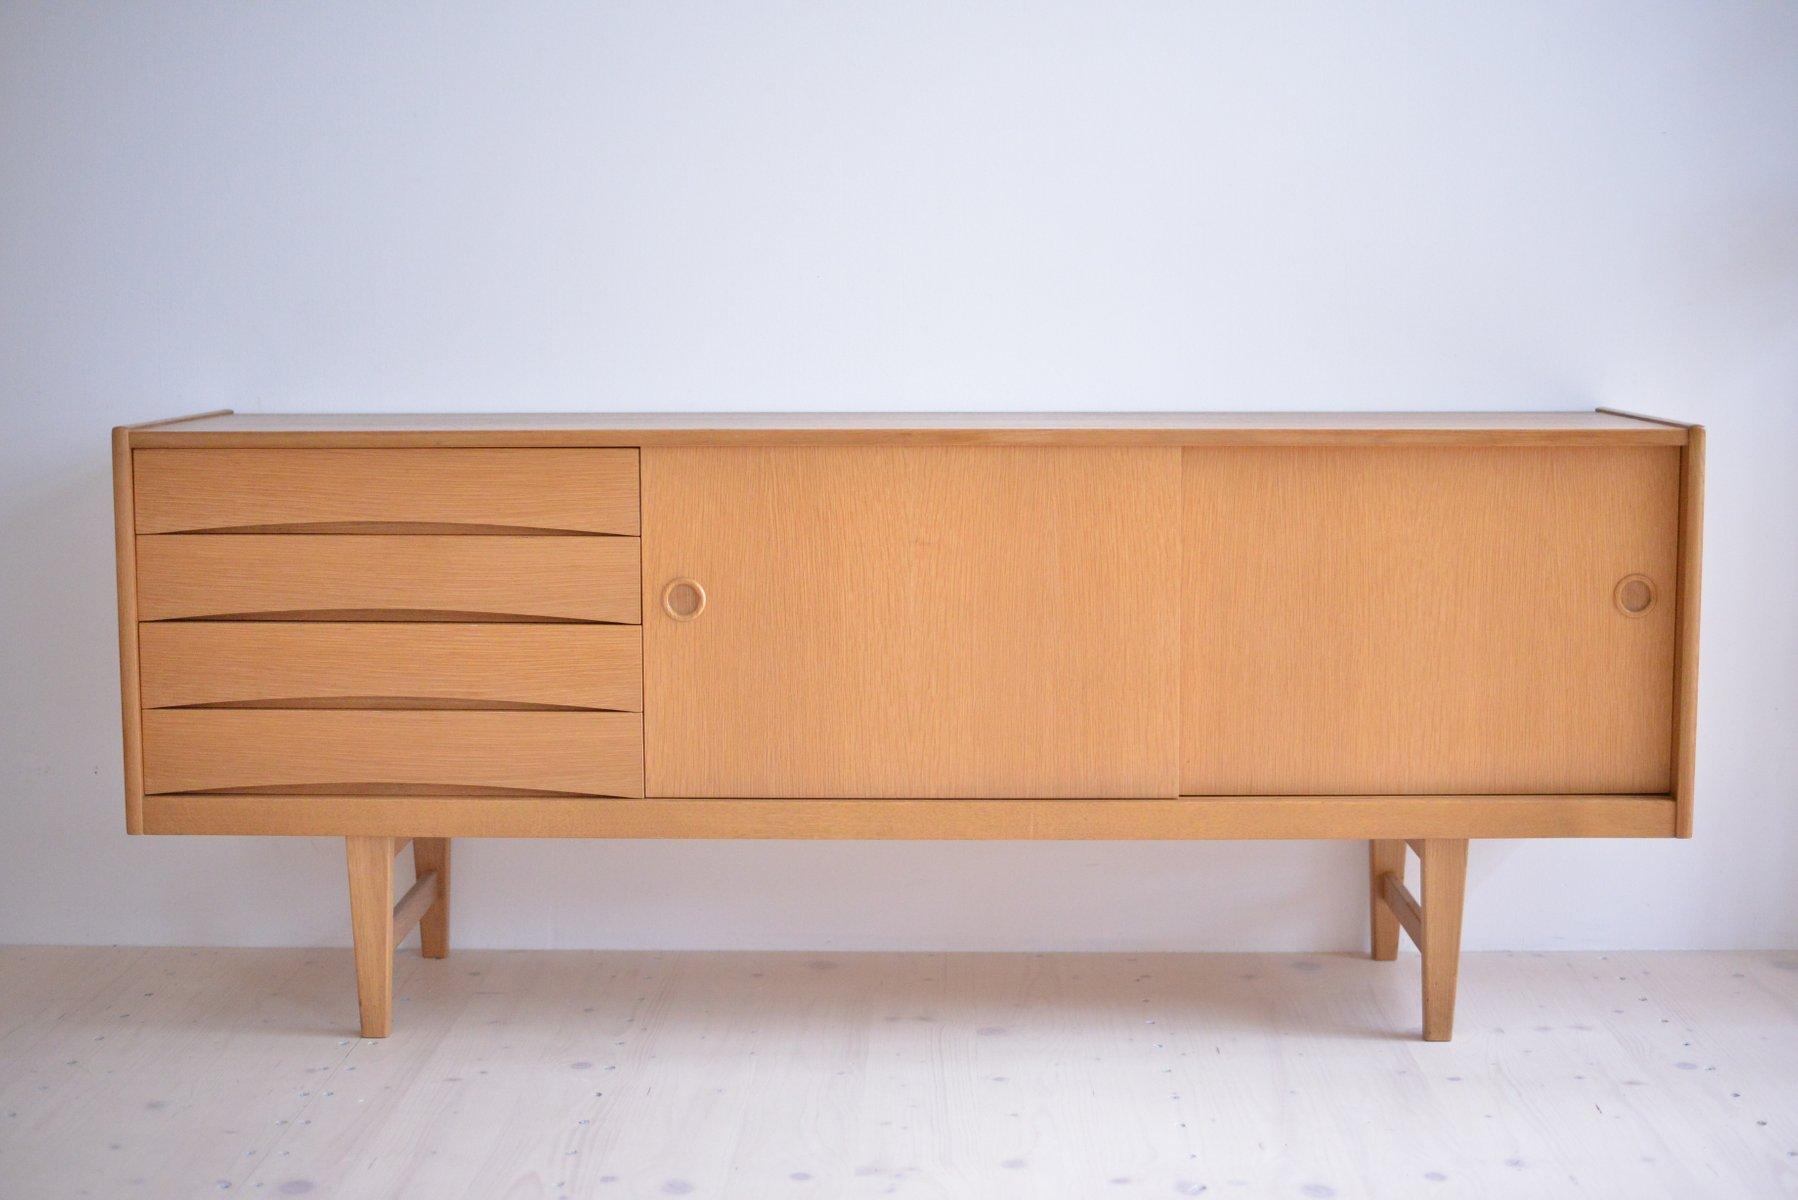 Ikea Bjursta Credenza : Sideboard ikea furniture norden instructions